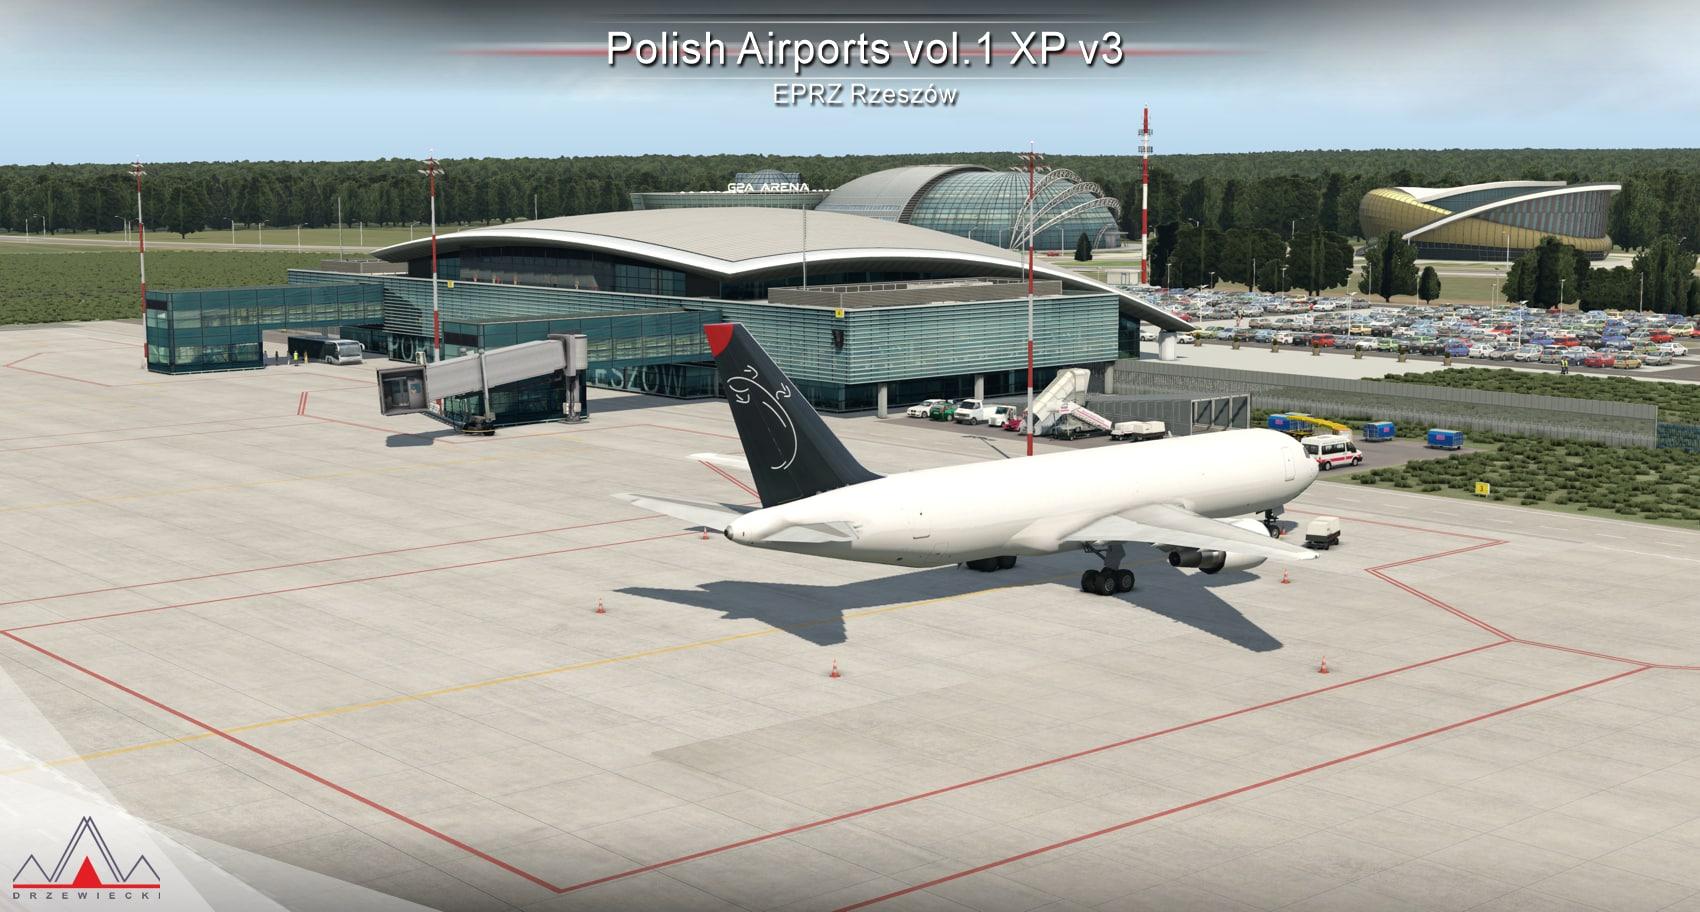 Drzewiecki Design – Polish Airports Vol.1 XP (V3) XP11